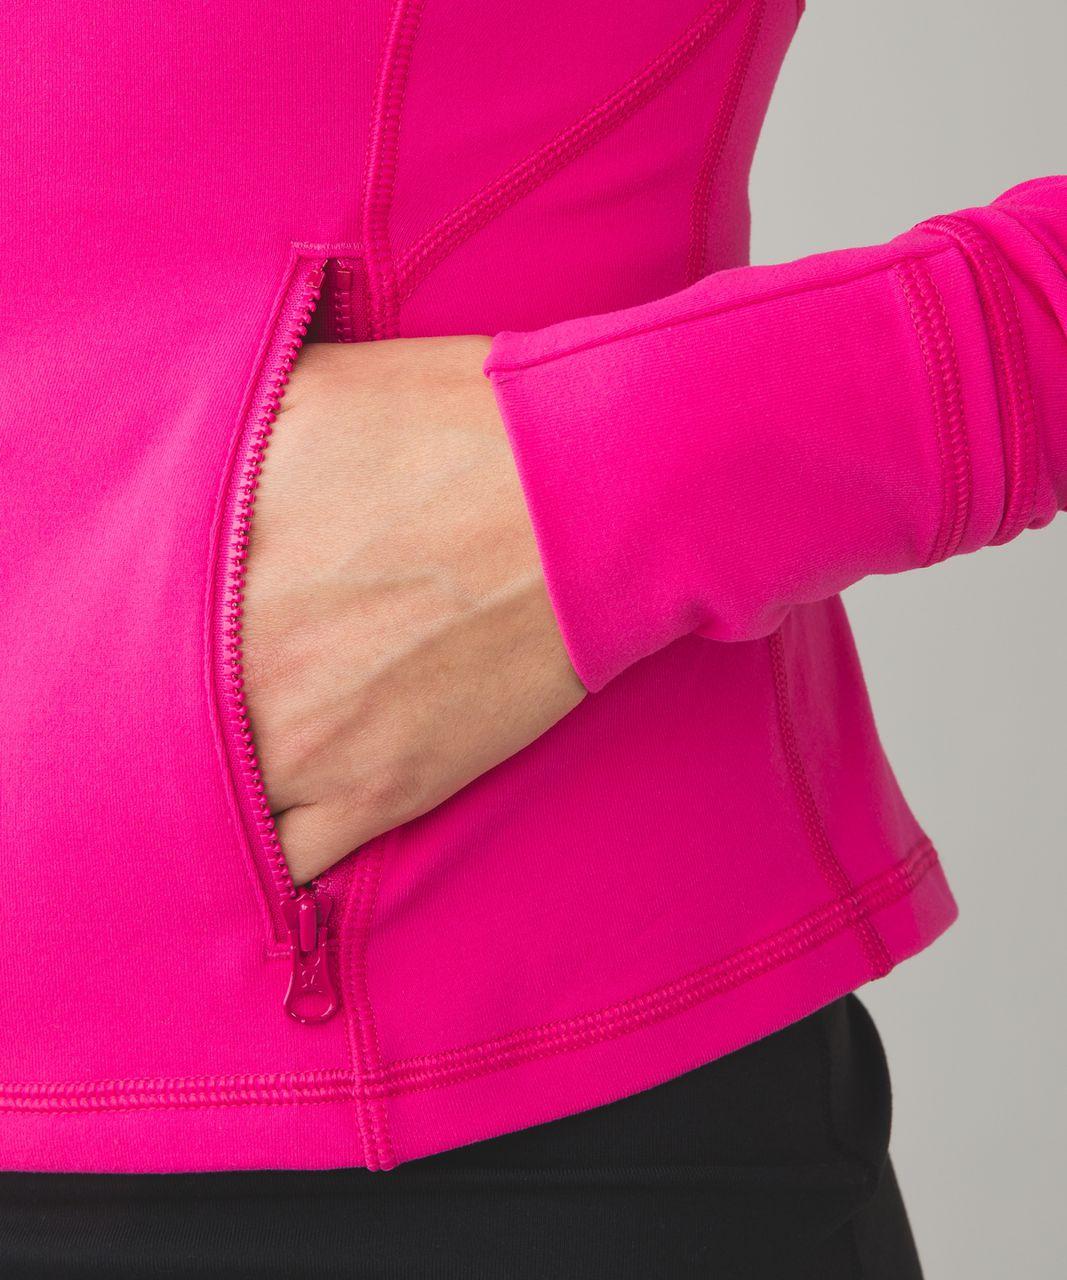 Lululemon Hustle In Your Bustle Jacket - Jewelled Magenta